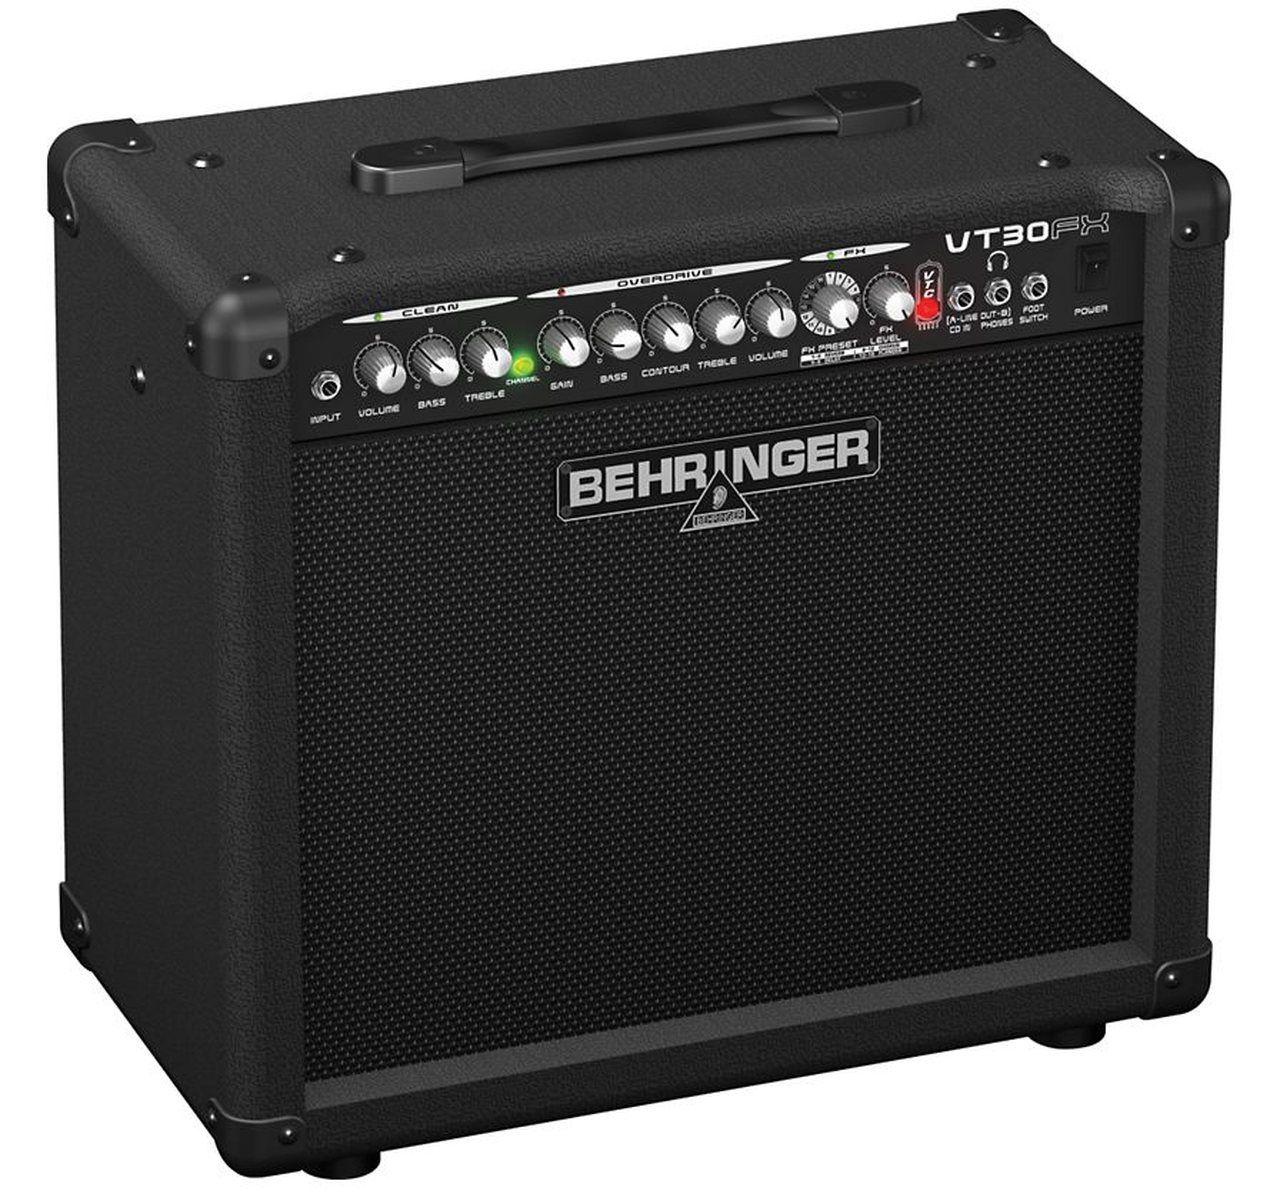 Caixa Amplificada Behringer Virtube VT30FX 110W 1x10